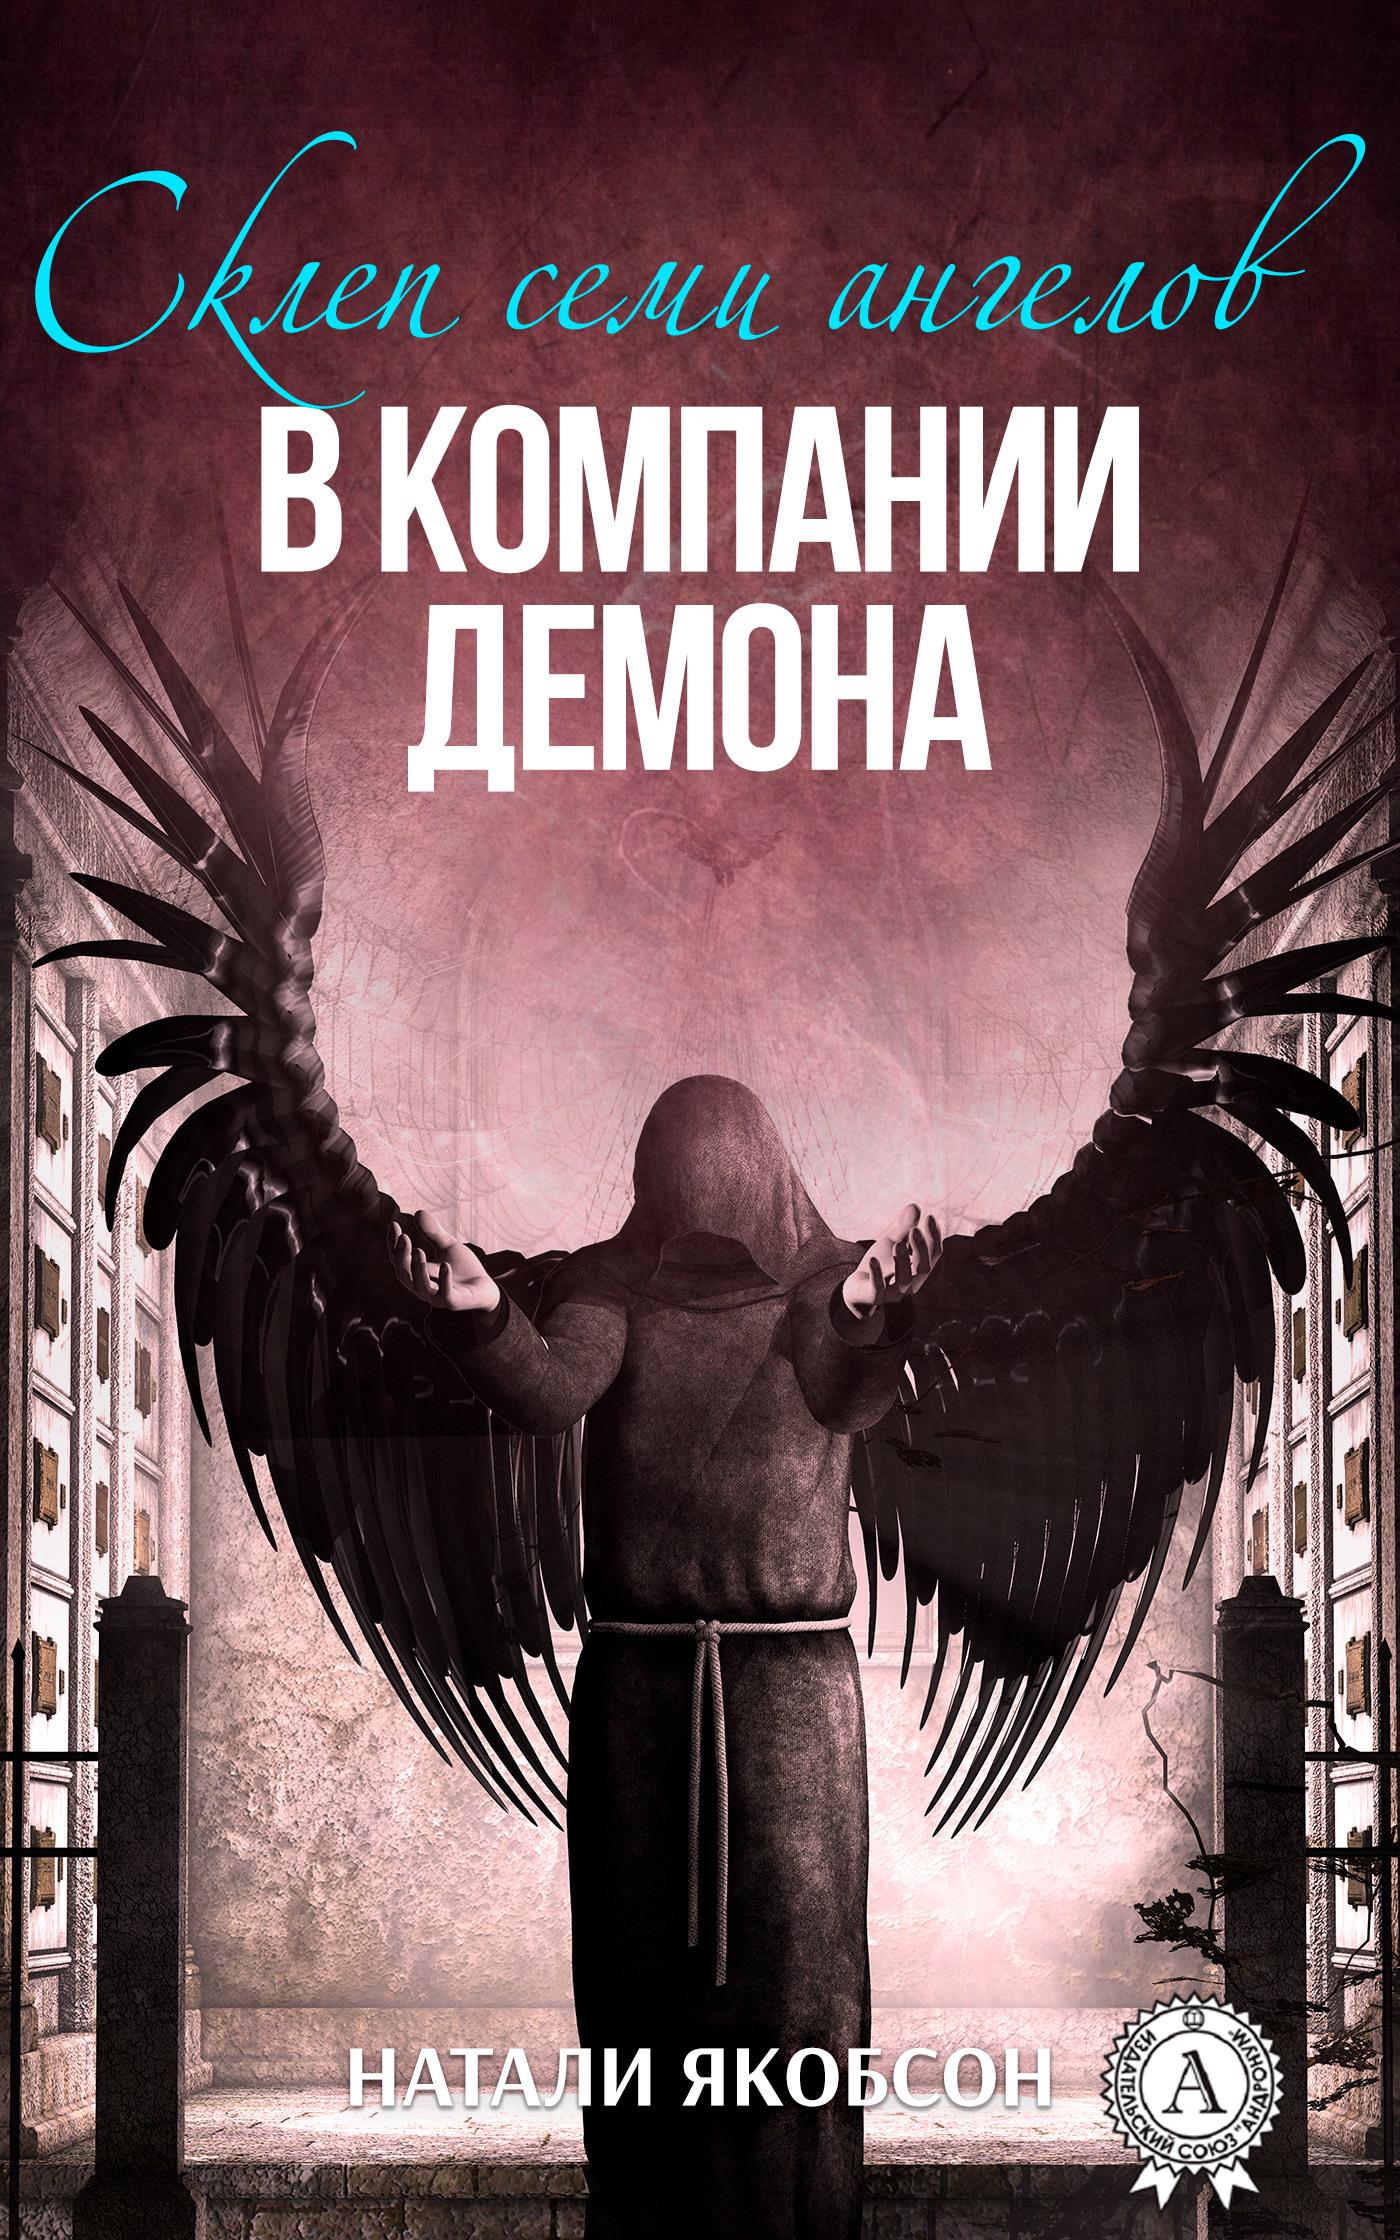 Натали Якобсон - В компании демона